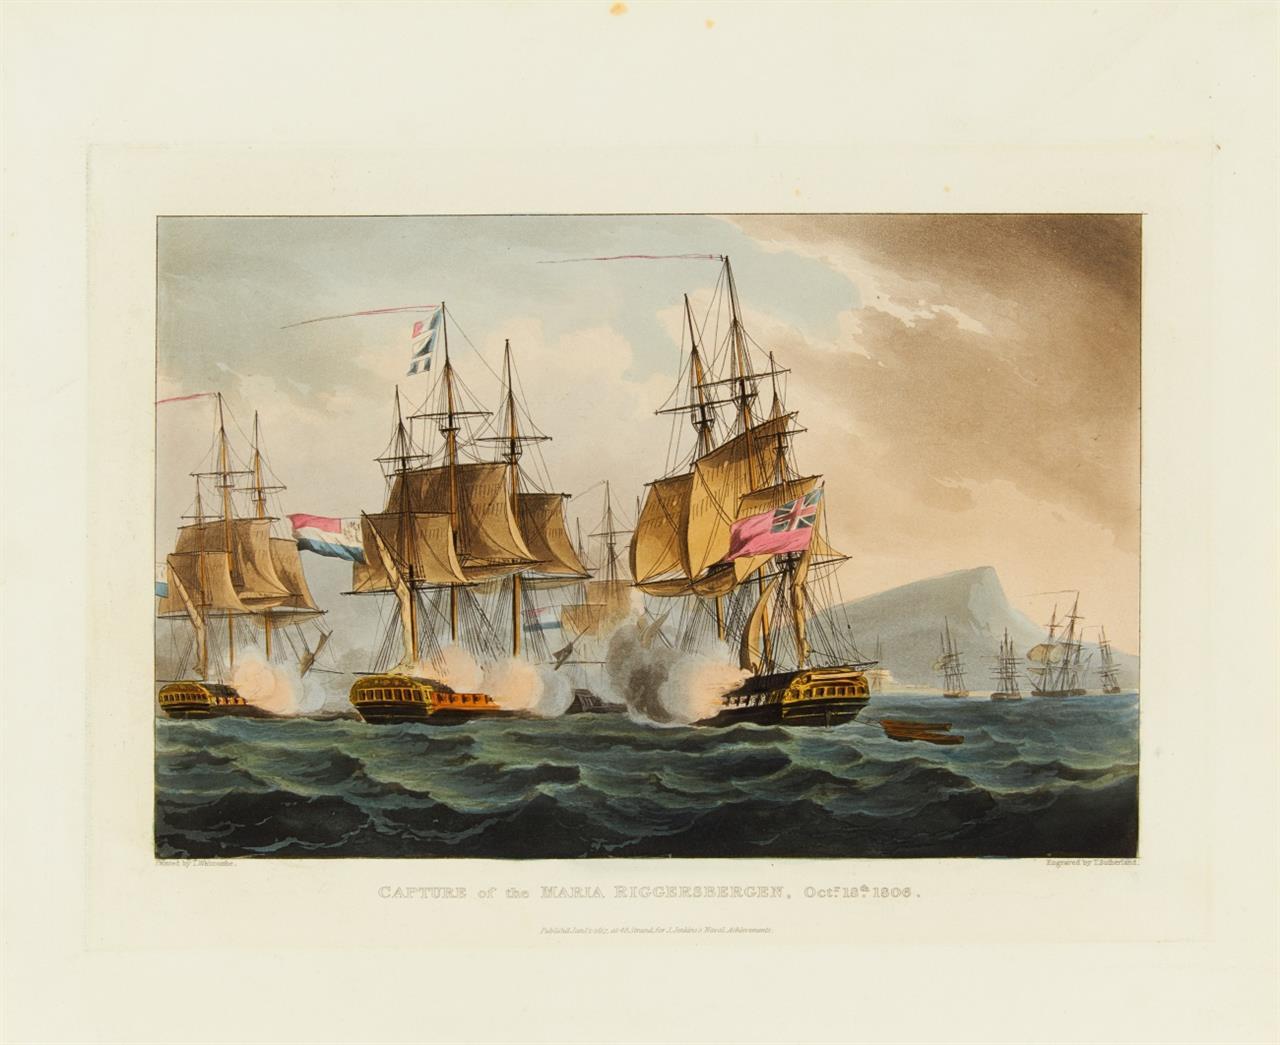 Seeschlachten. T. Sutherland nach T. Whitcombe. 8 Seeschlachten 1796 - 1810. 8 Blatt kolor. Aquatinta-Radierungen.